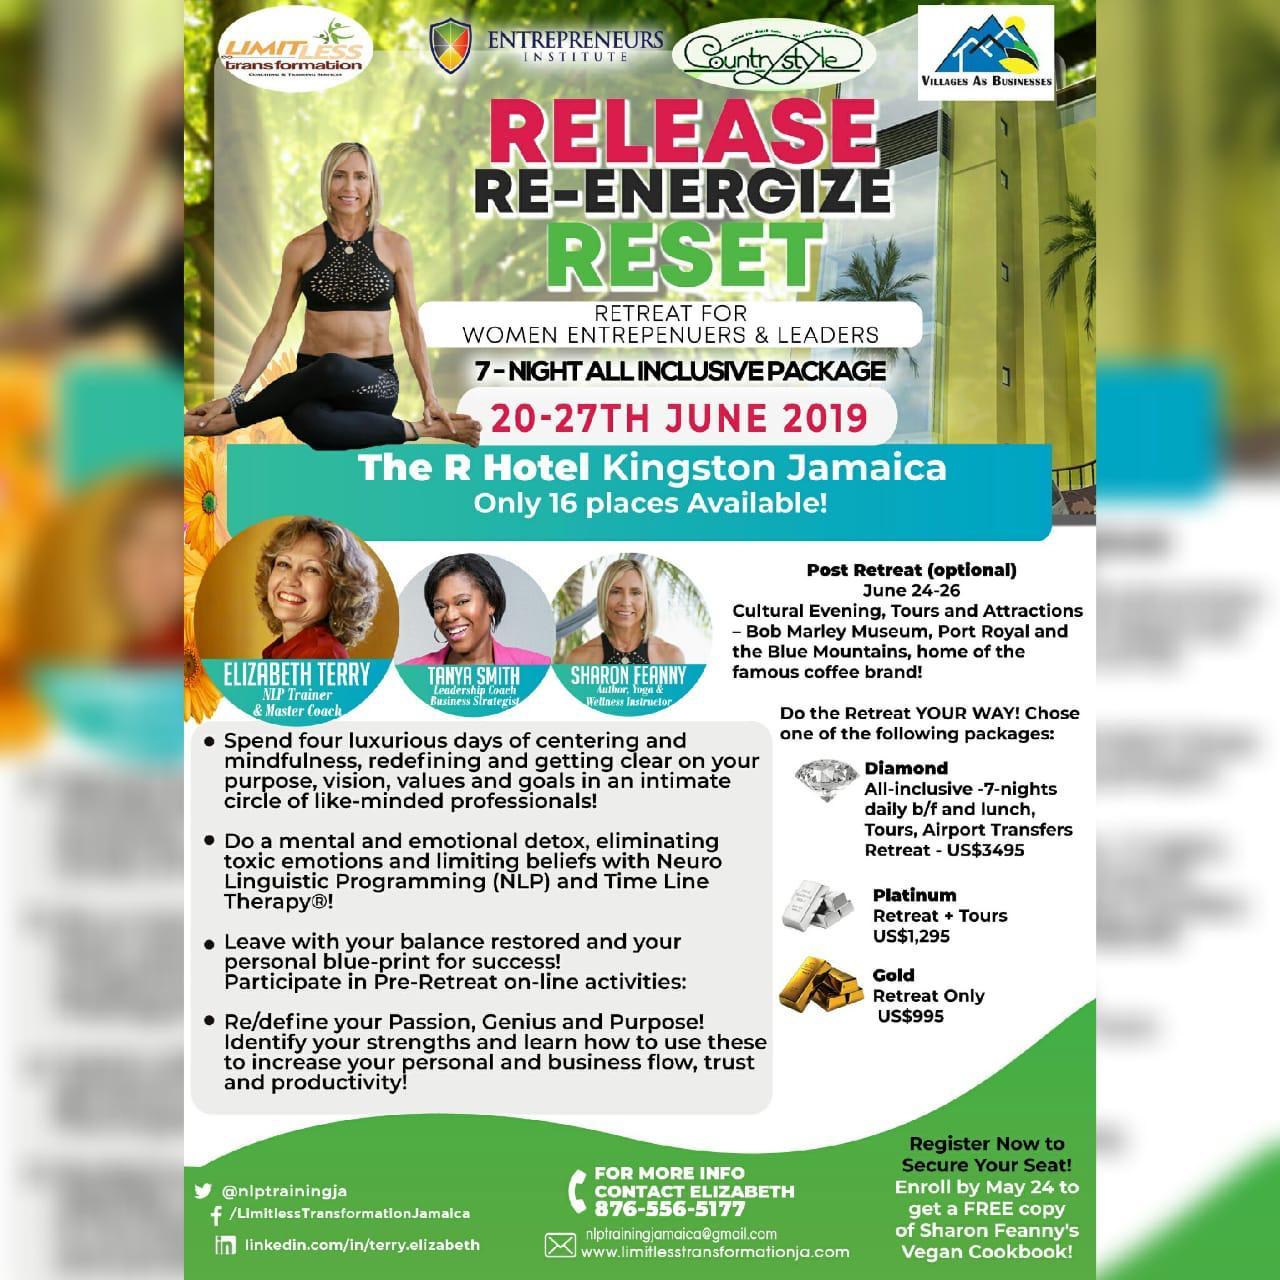 Release Reenergize Reset